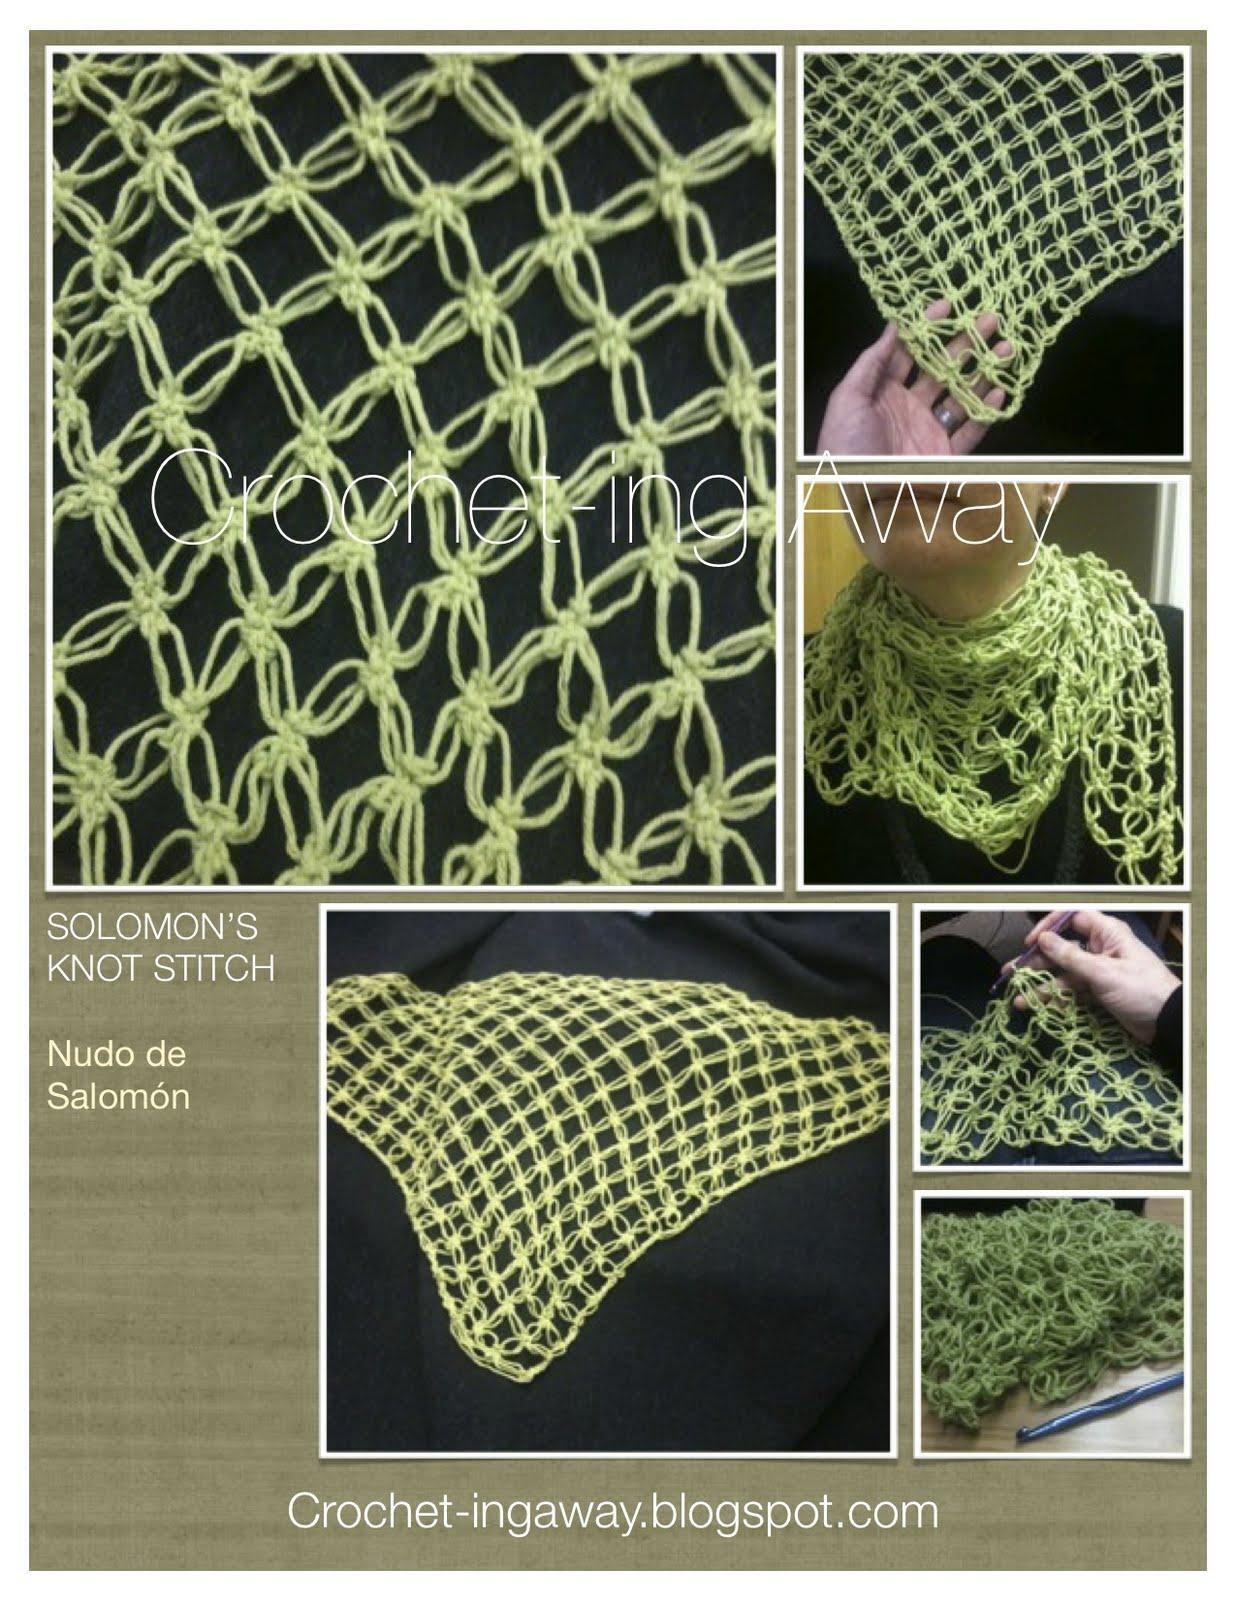 Crochet Knot Stitch Instructions : Crochet-ing Away: M?s nudo de Salomon / More Salomons Knot Stitch